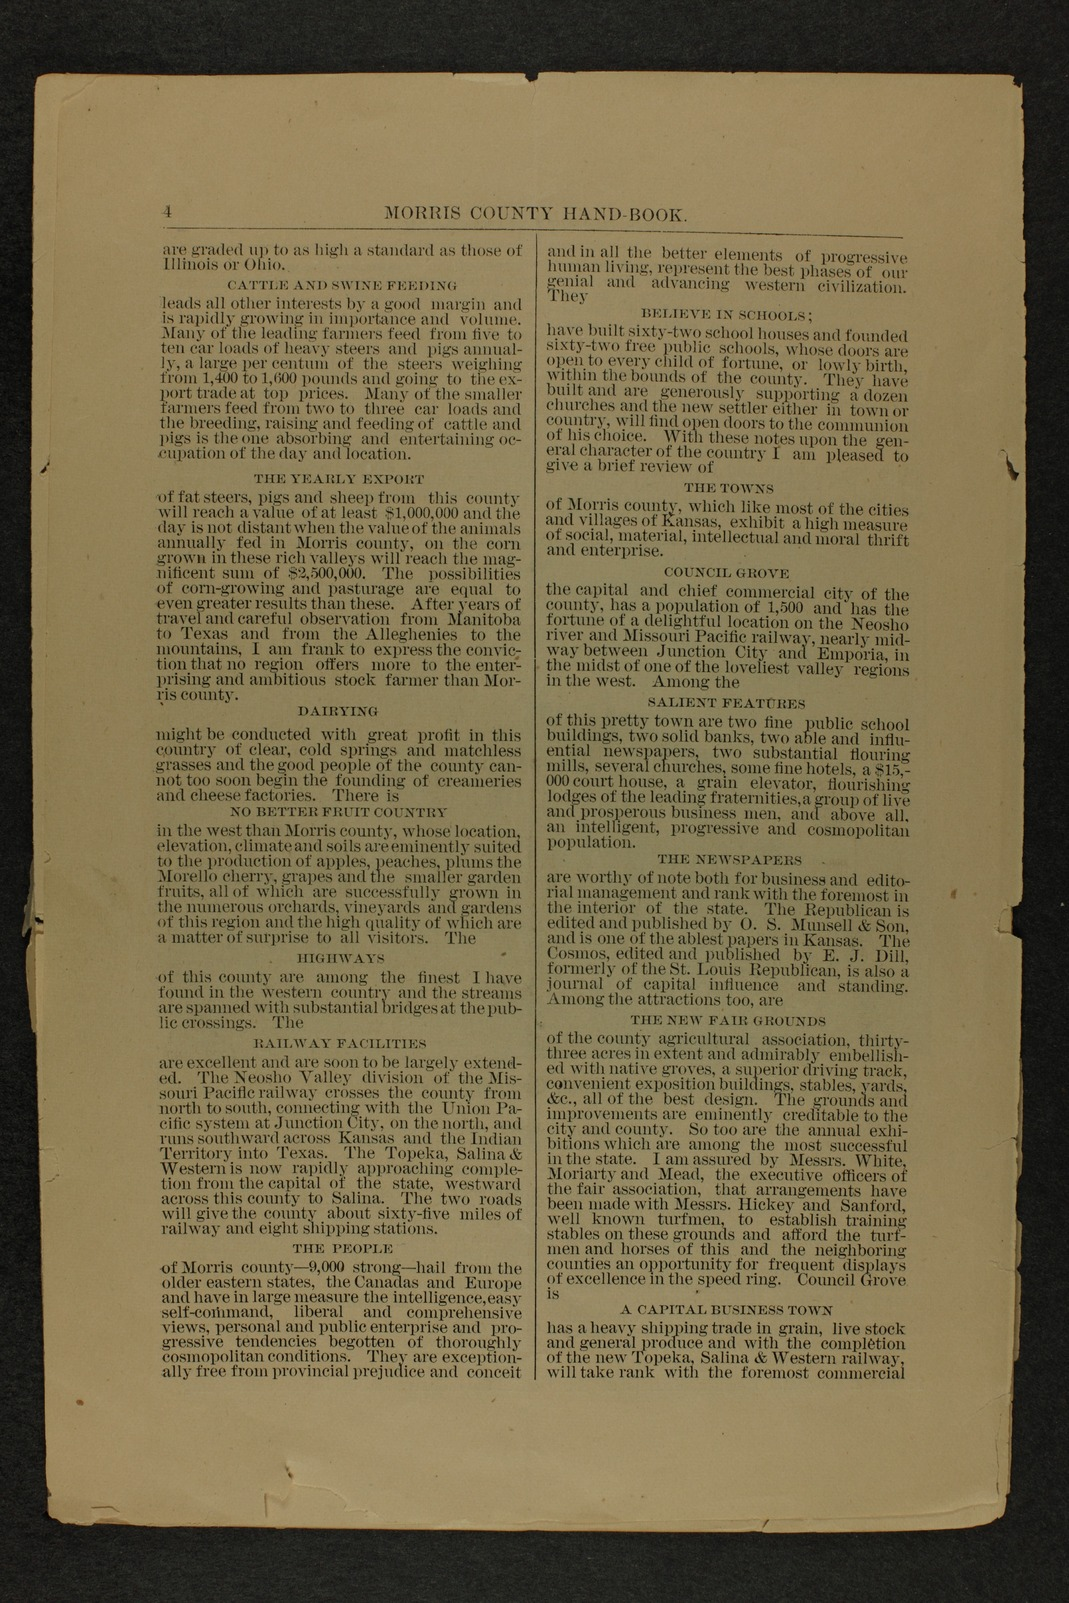 Handbook of Morris County, Kansas - 4